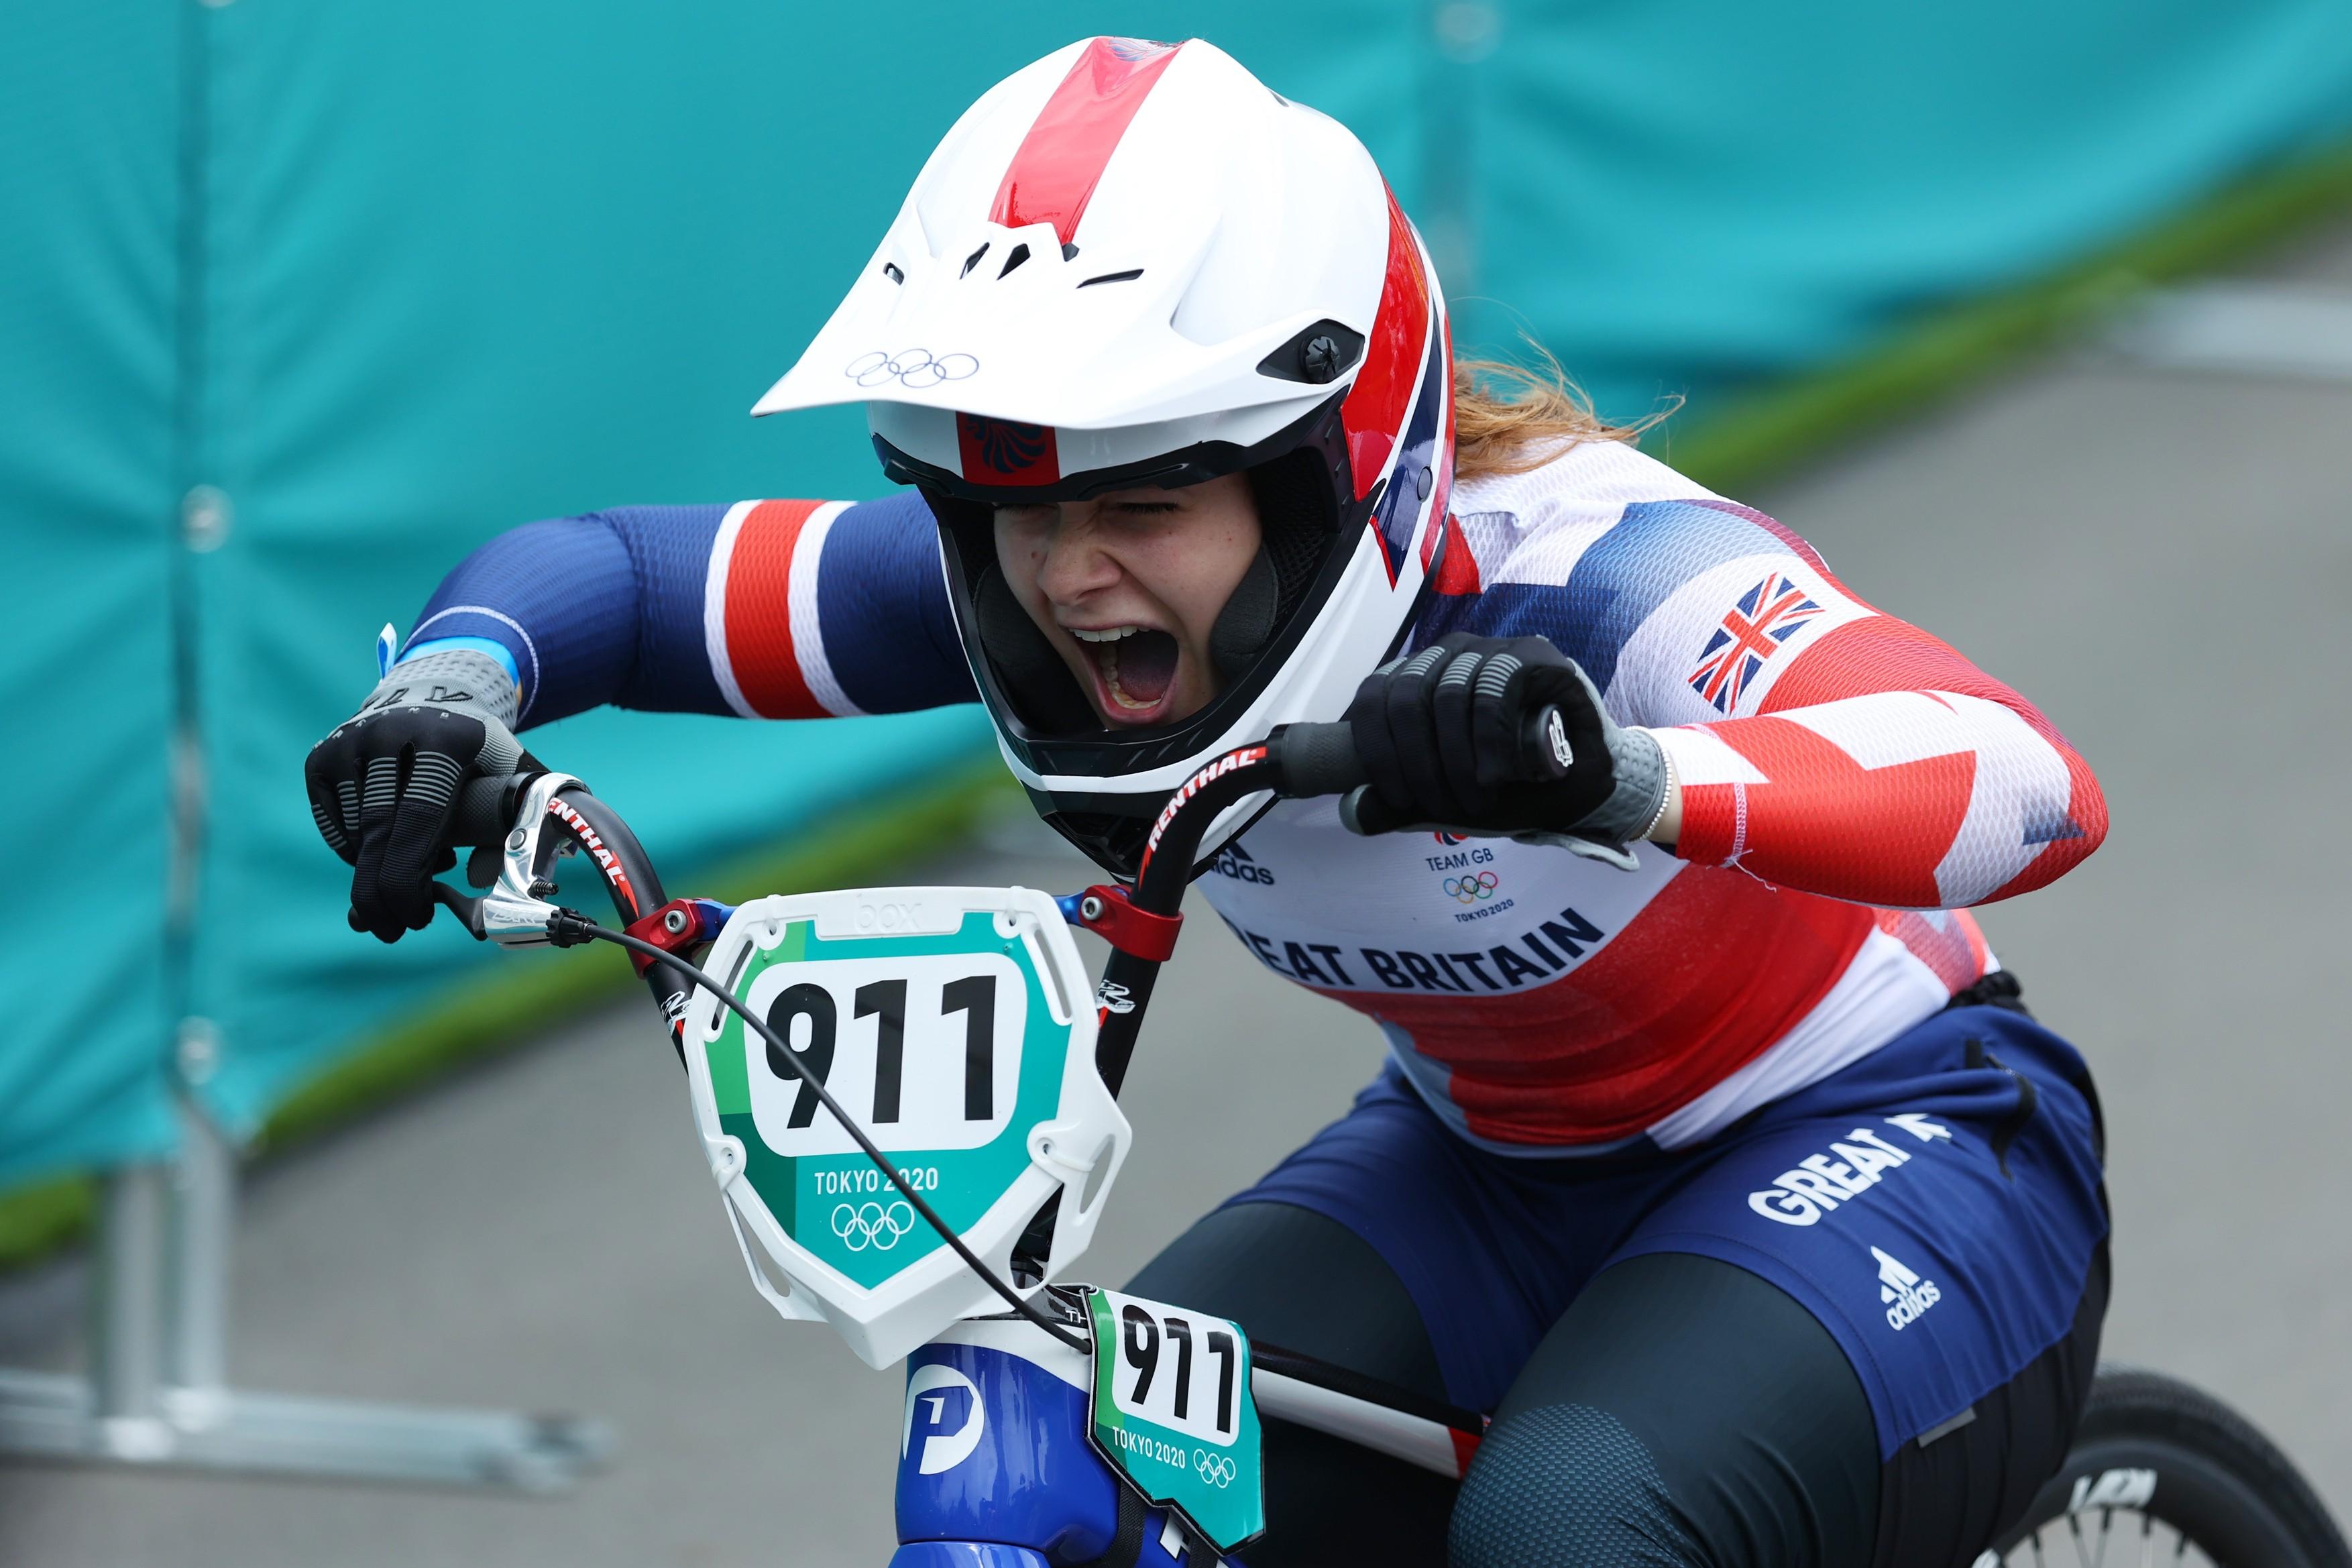 Campioana olimpica la BMX a ajuns la JO 2020 prin crowdfunding, dupa ce Marea Britanie a decis sa finanteze doar echipa masculina